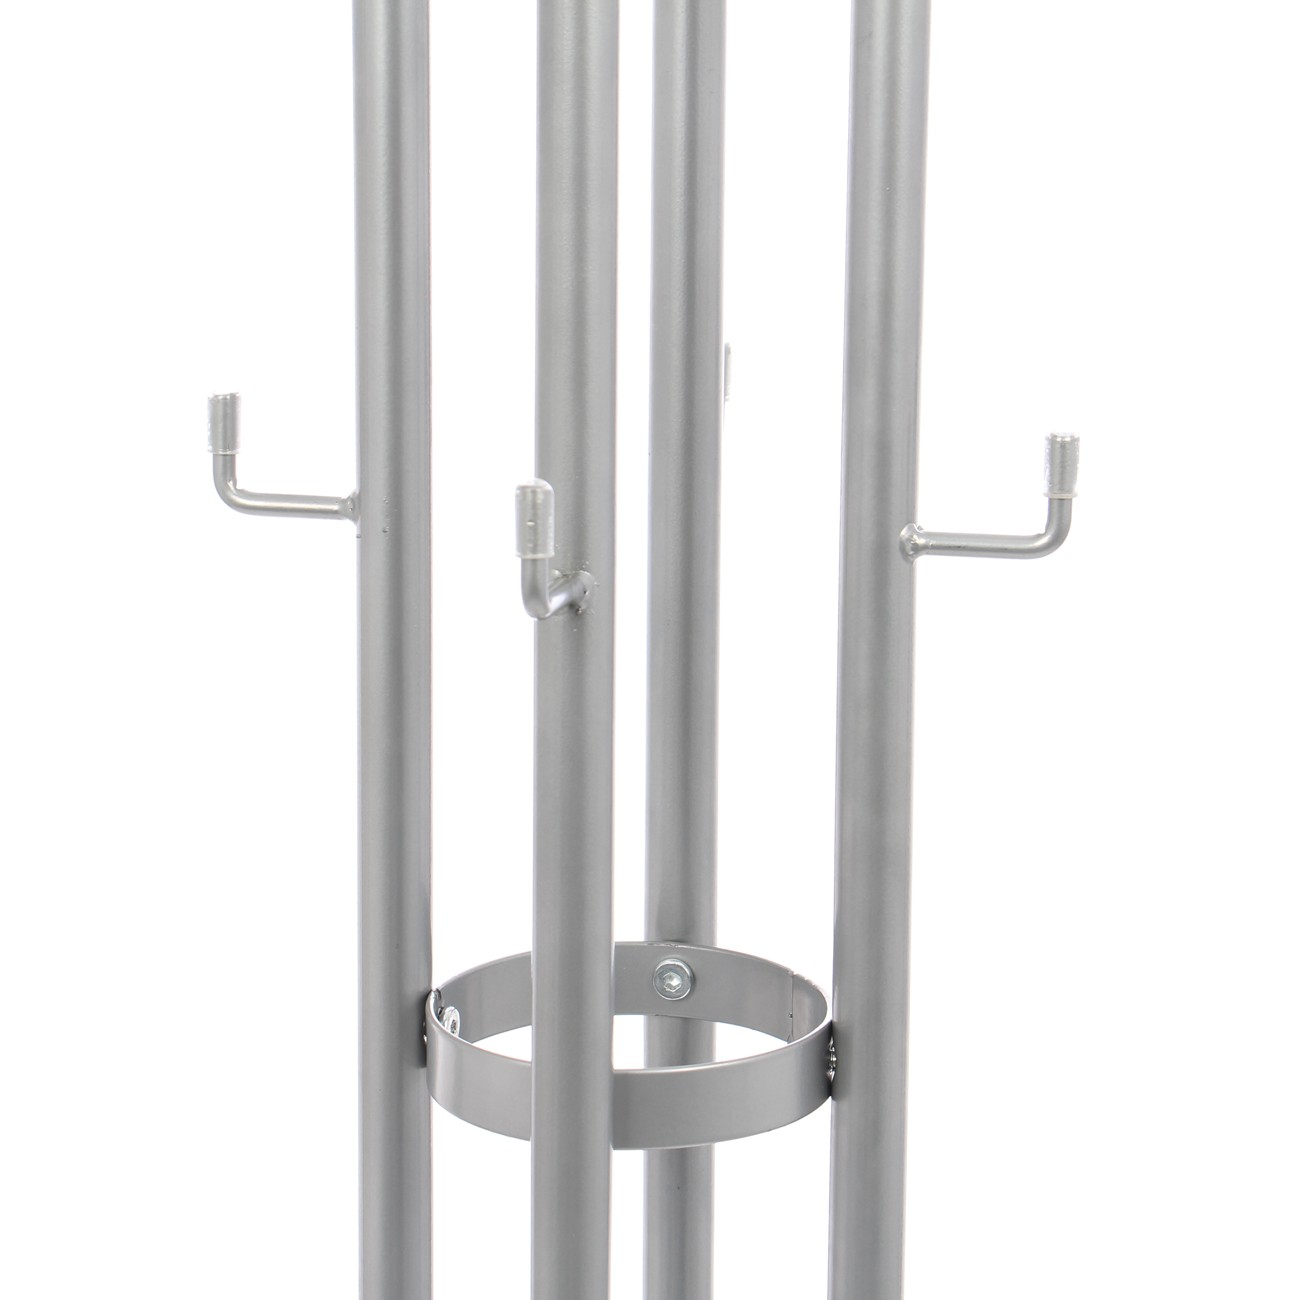 Cuier hol tip pom ST25184 cu 12 agatatori, gri, 365 x 520 x 1700 mm, 1C